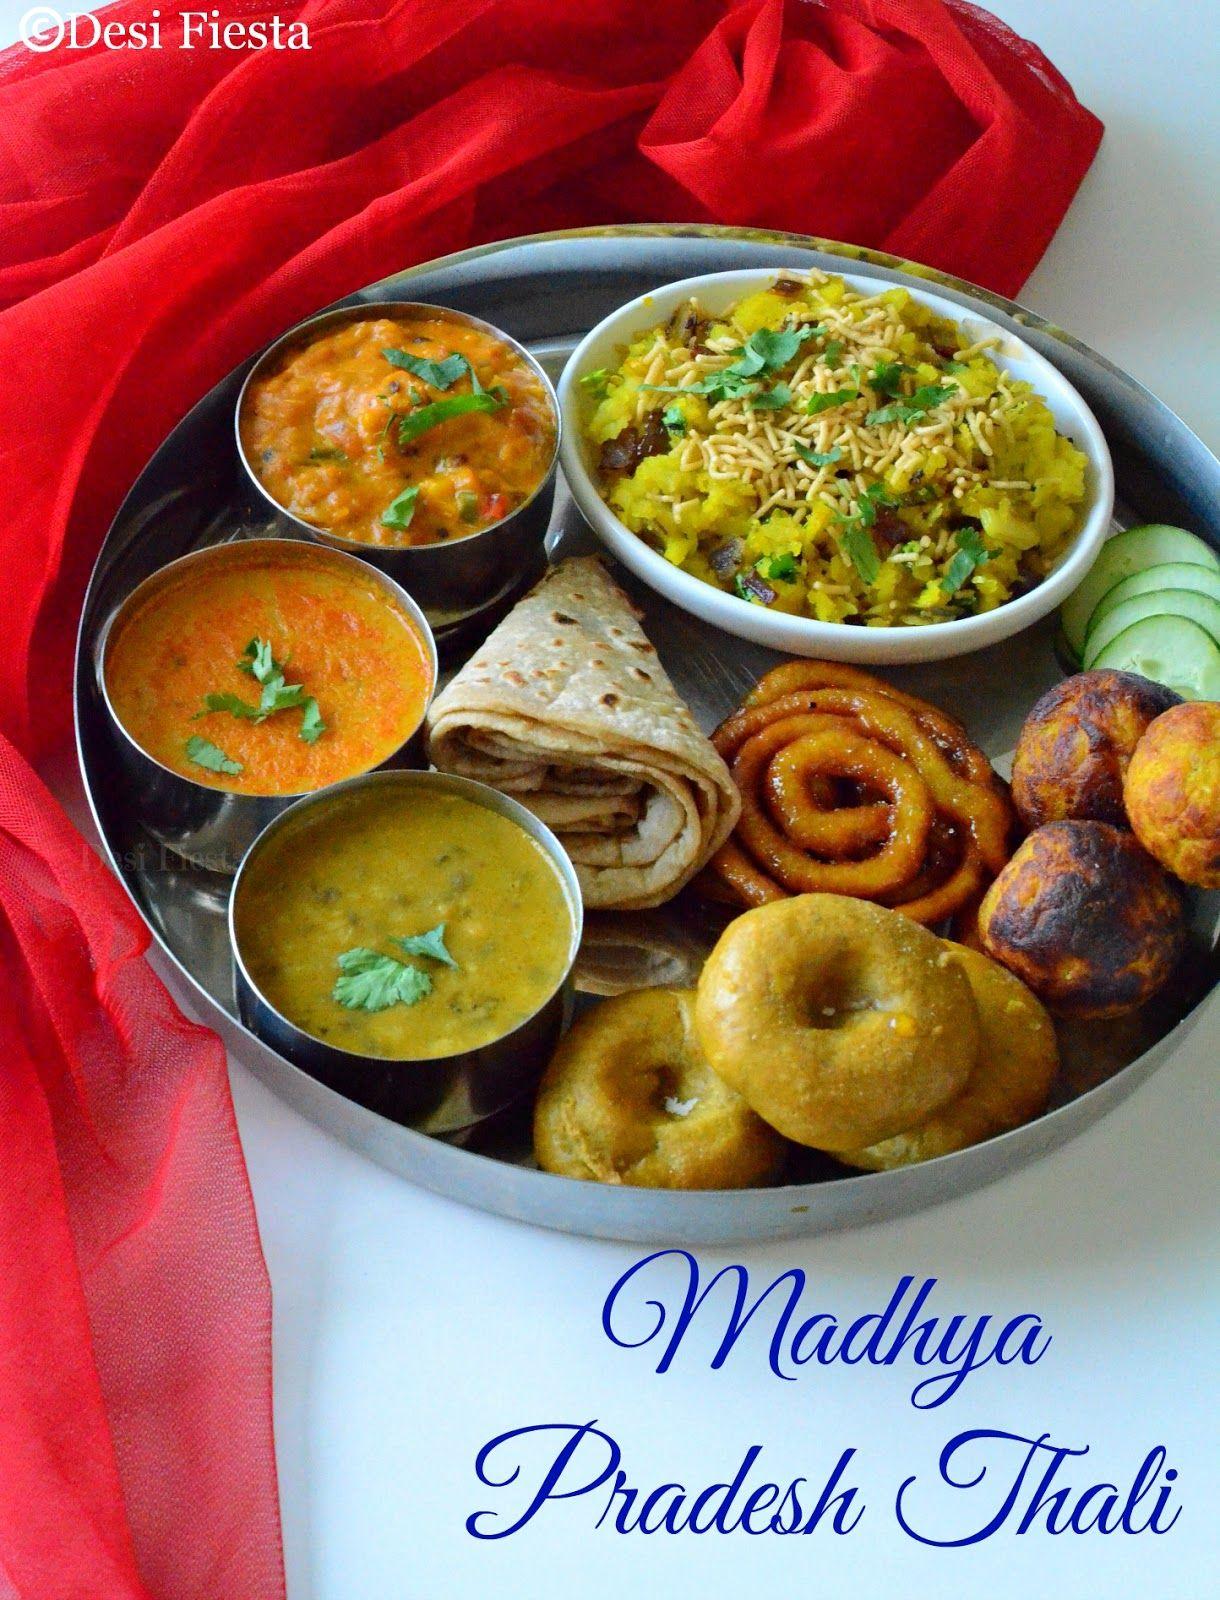 Desi Fiesta Madhya Pradesh Thali Indian Food Recipes